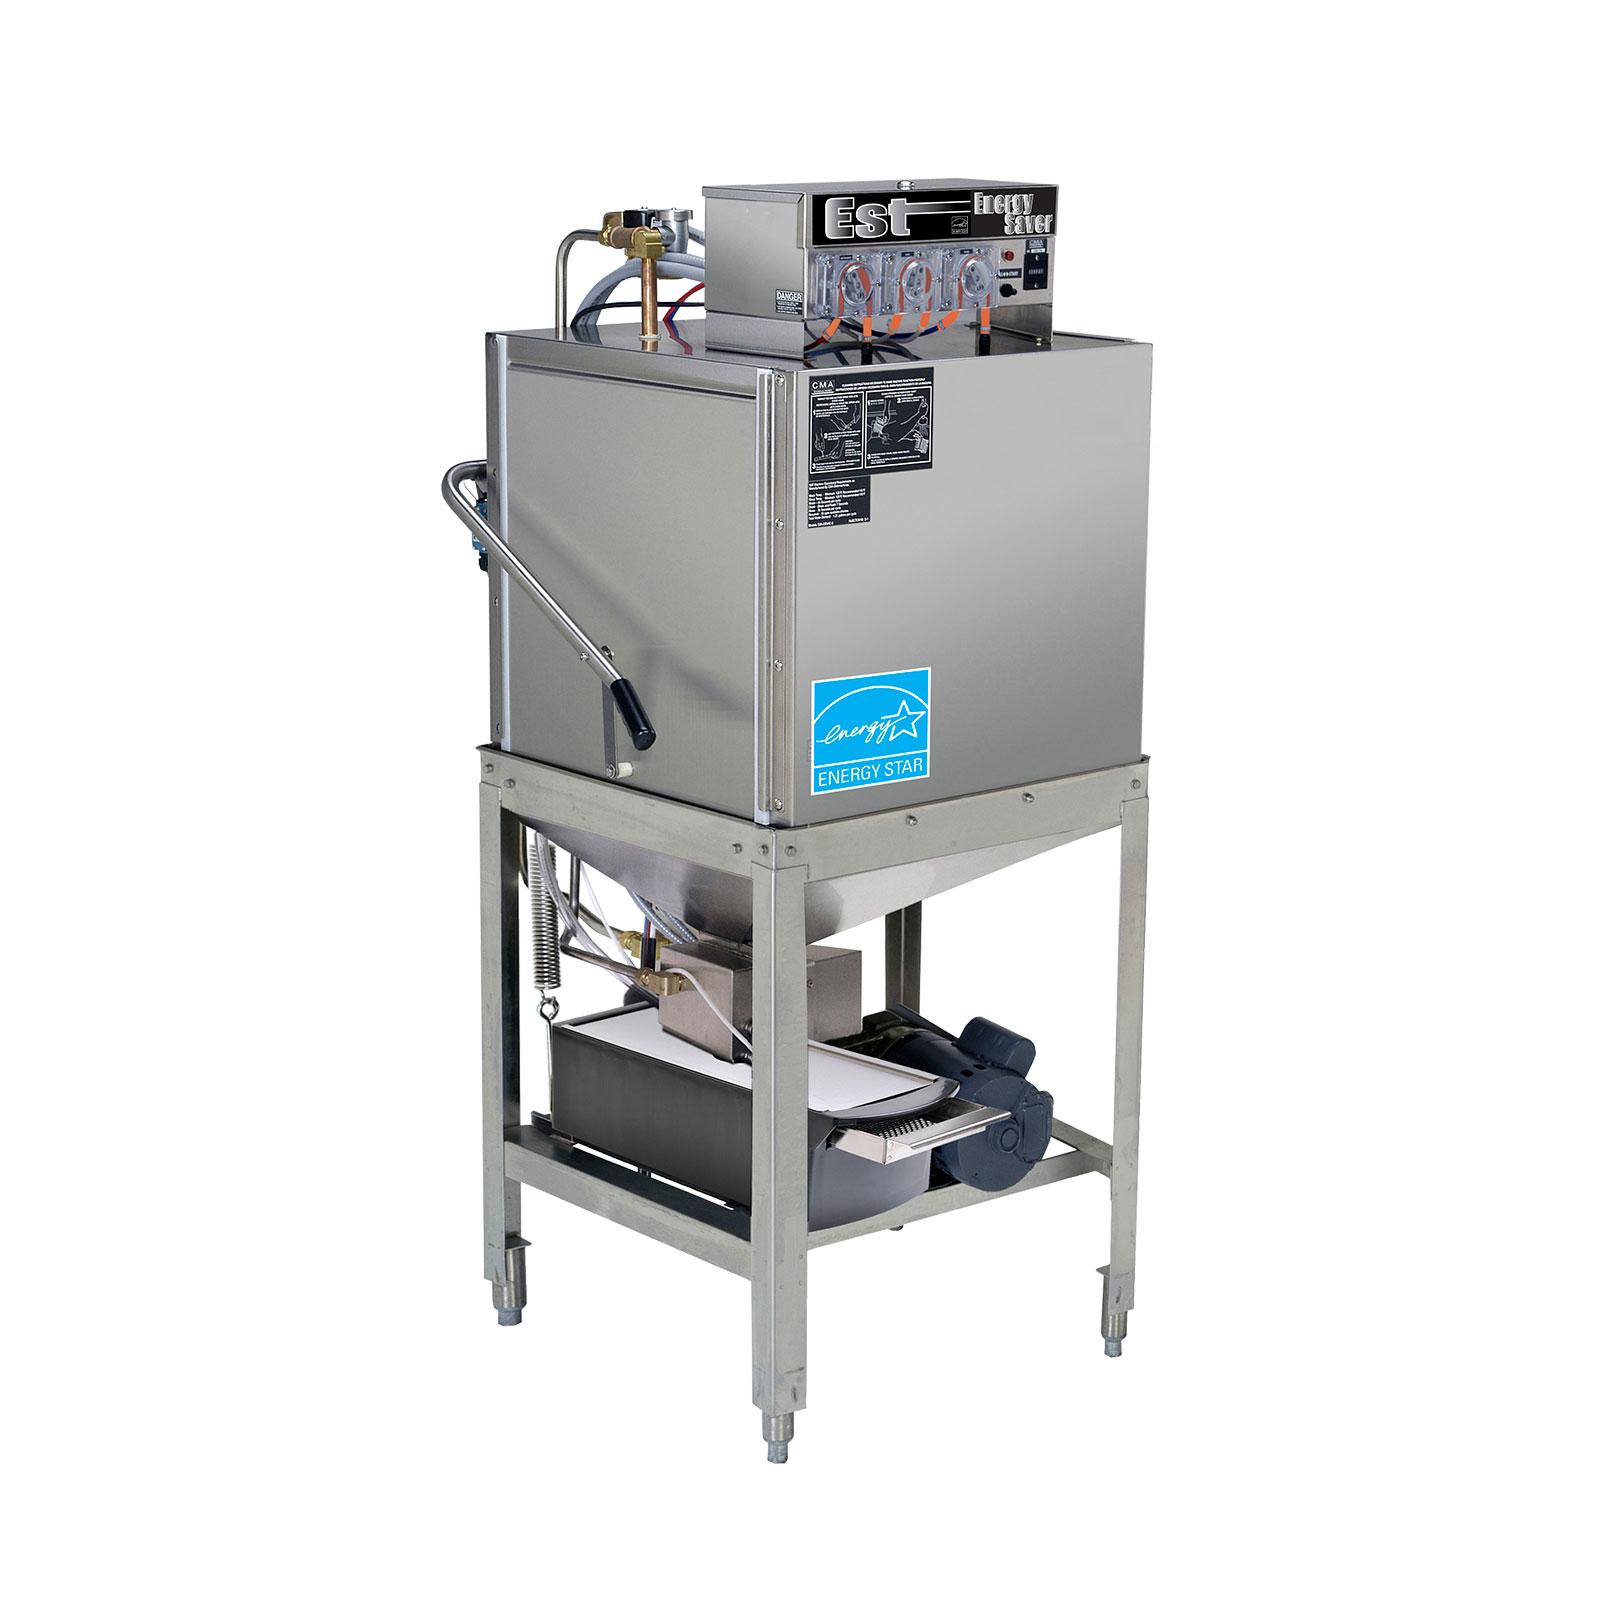 EST-AH CMA Dishmachines dishwasher, door type